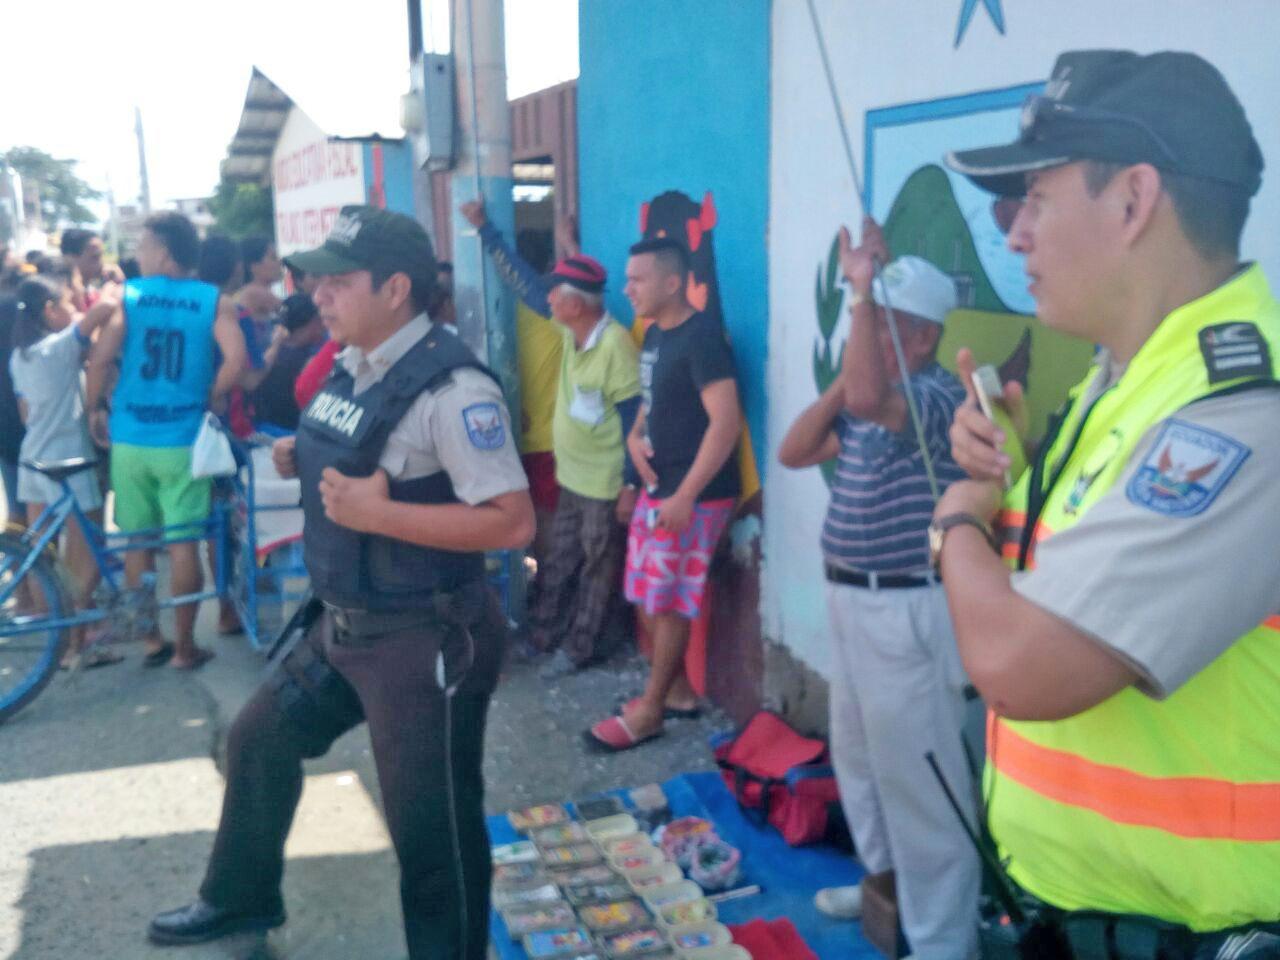 Ministerio del interior niega intento de robo de una menor for Ministerio del interior ecuador